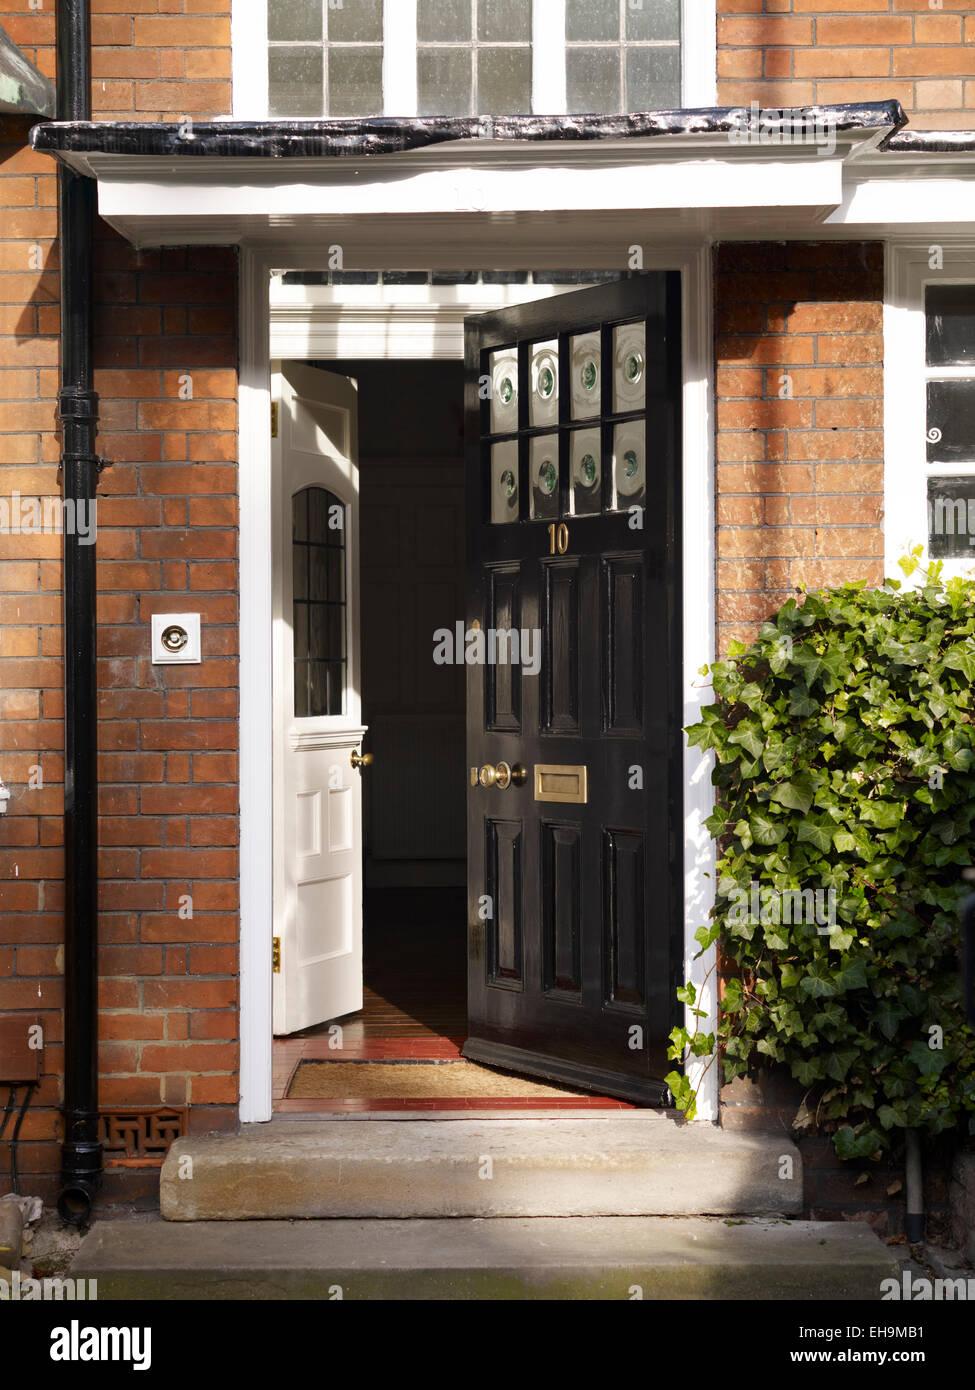 Open traditional black front door of redbrick residential ...